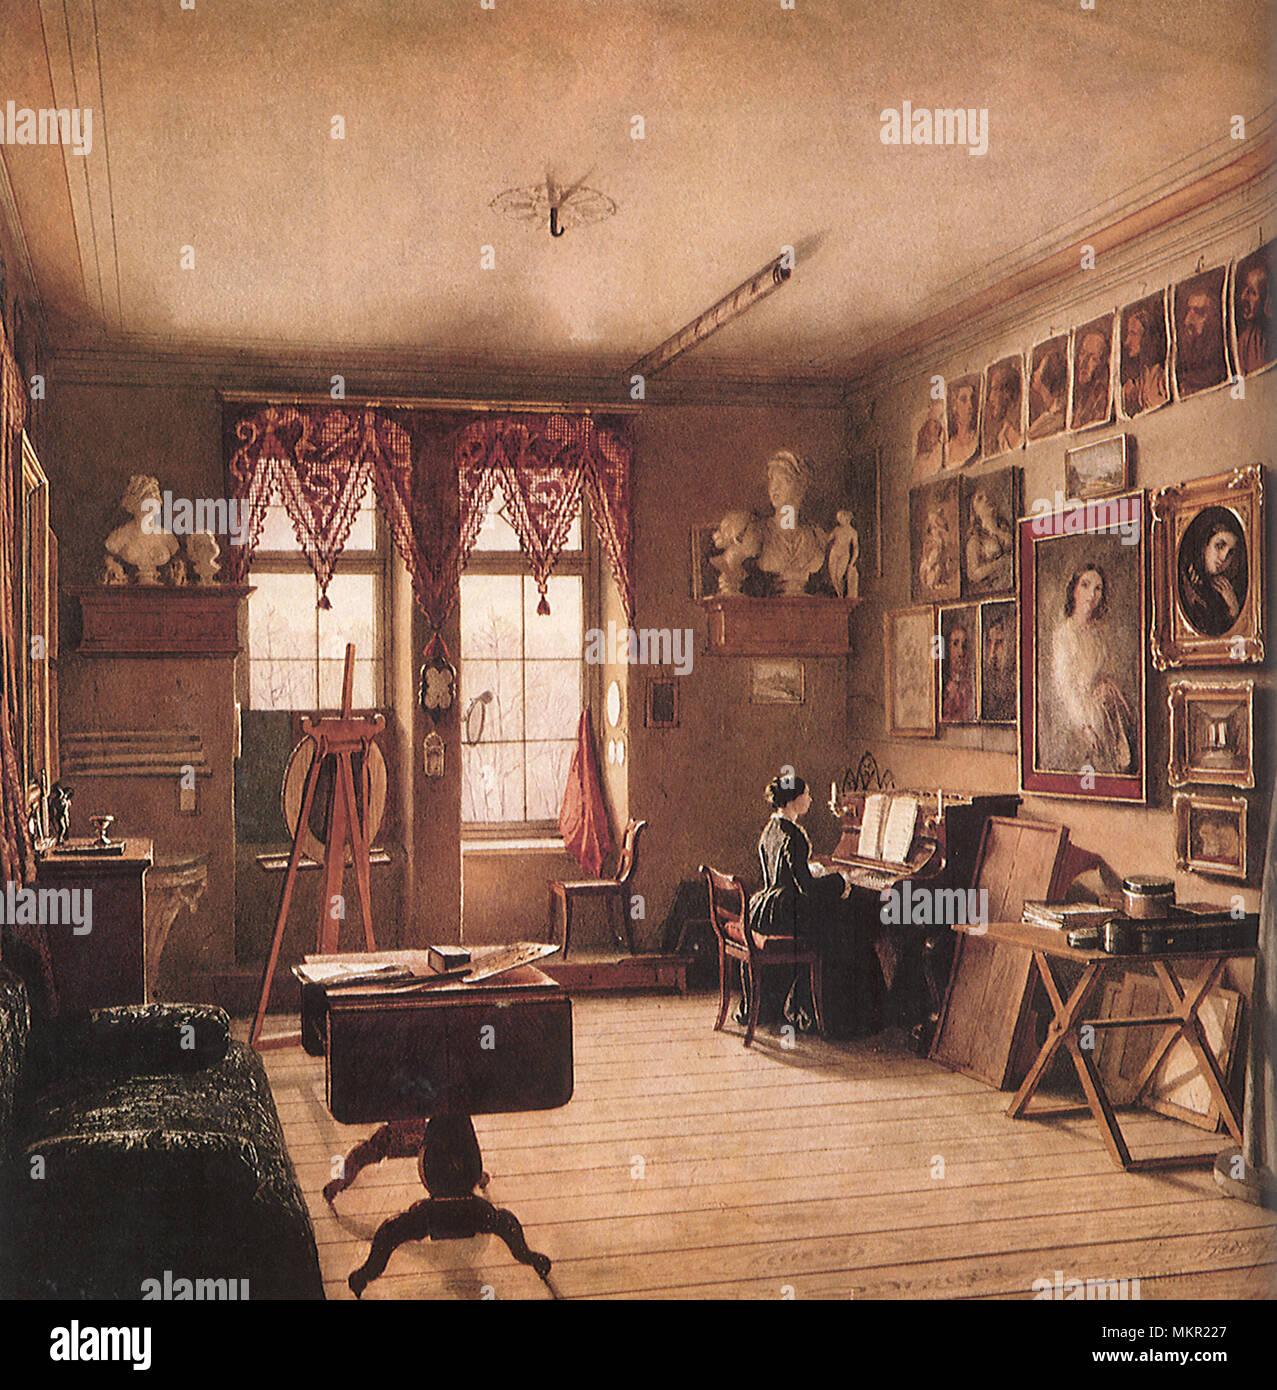 An Artist S Room In Berlin Stock Photo Alamy